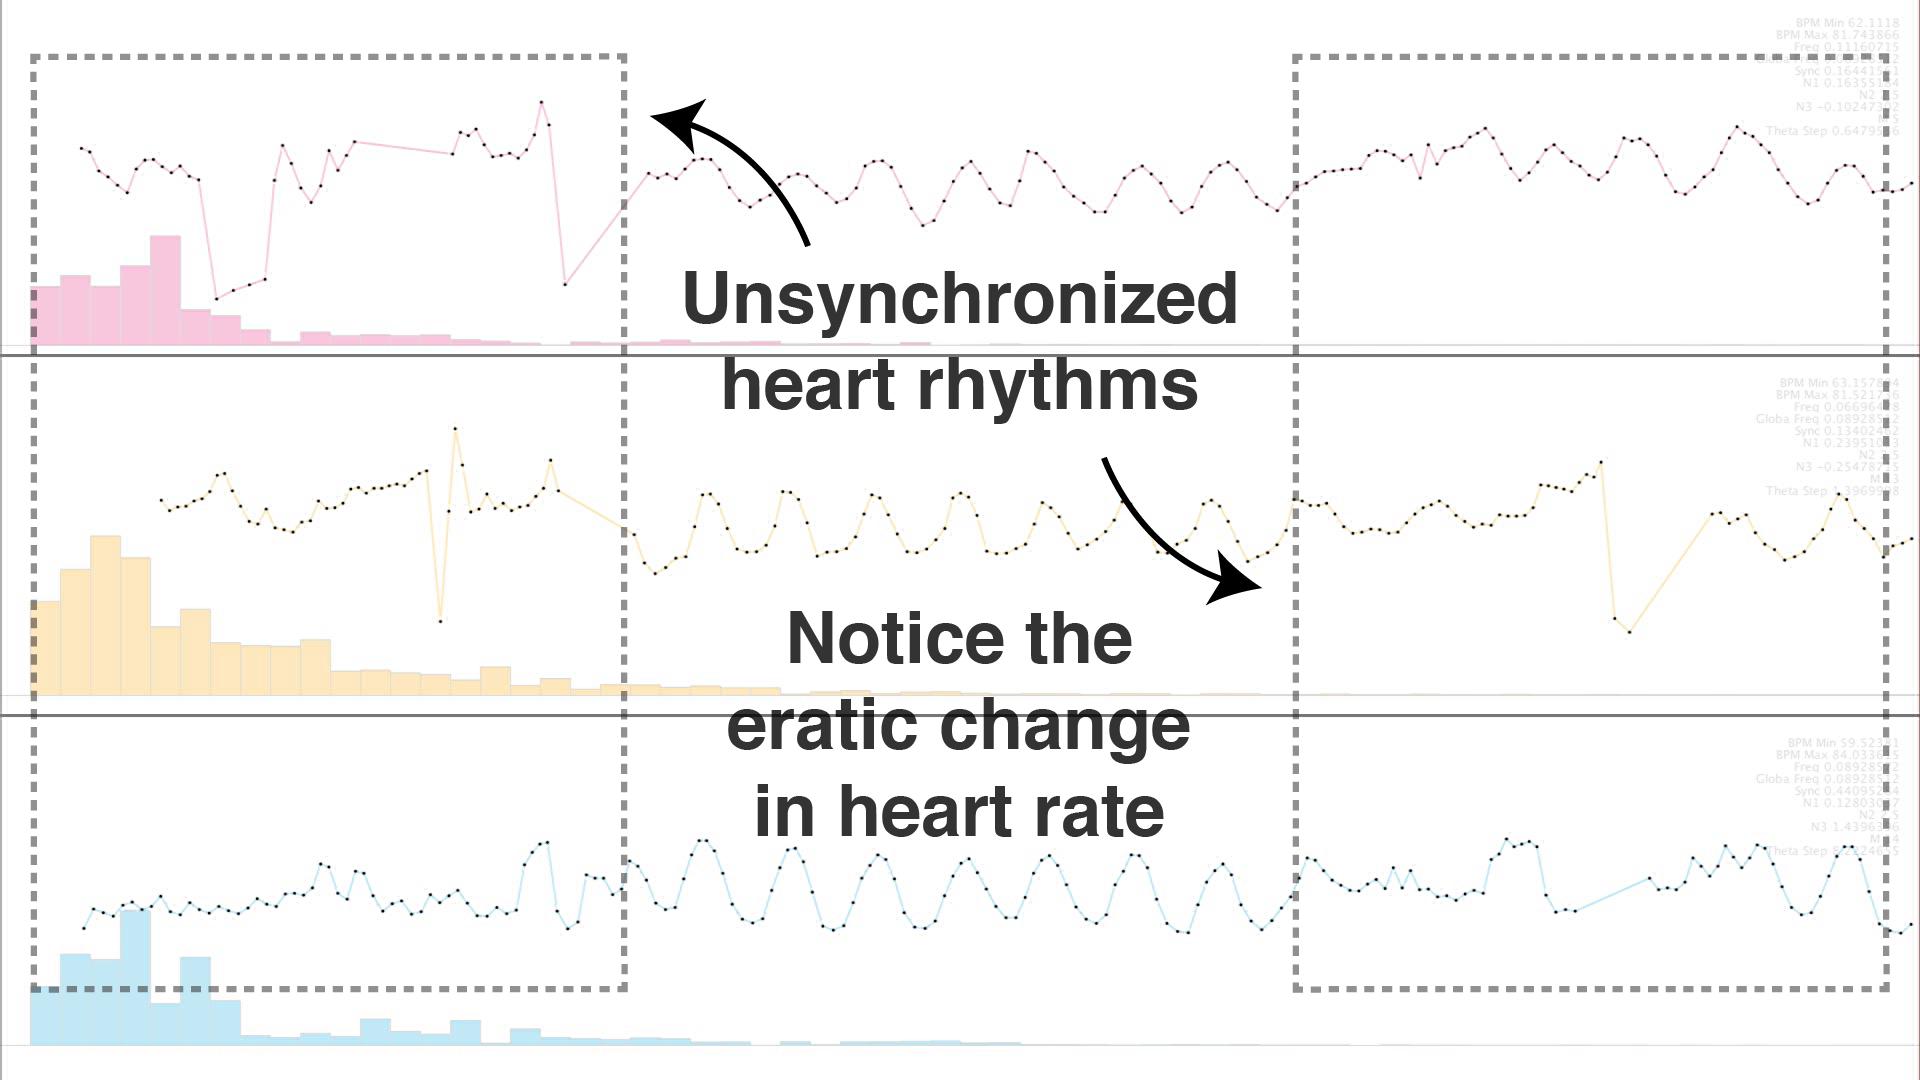 heartsync_graph_4